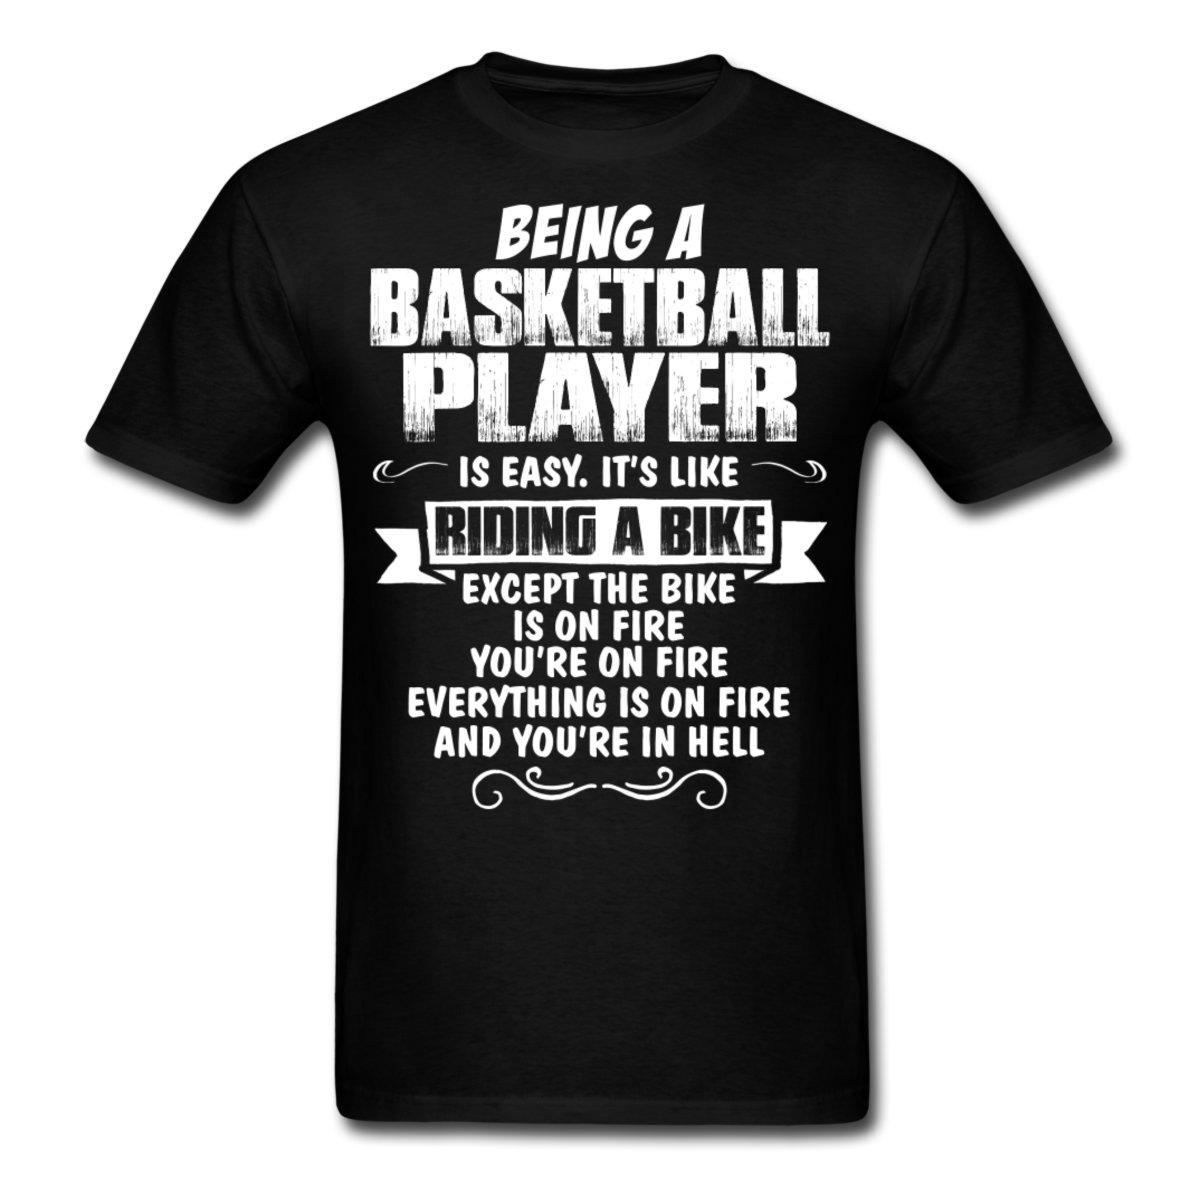 b990ff9a2 Basketball T-Shirt Designs For Regular Season - Gandy Ink